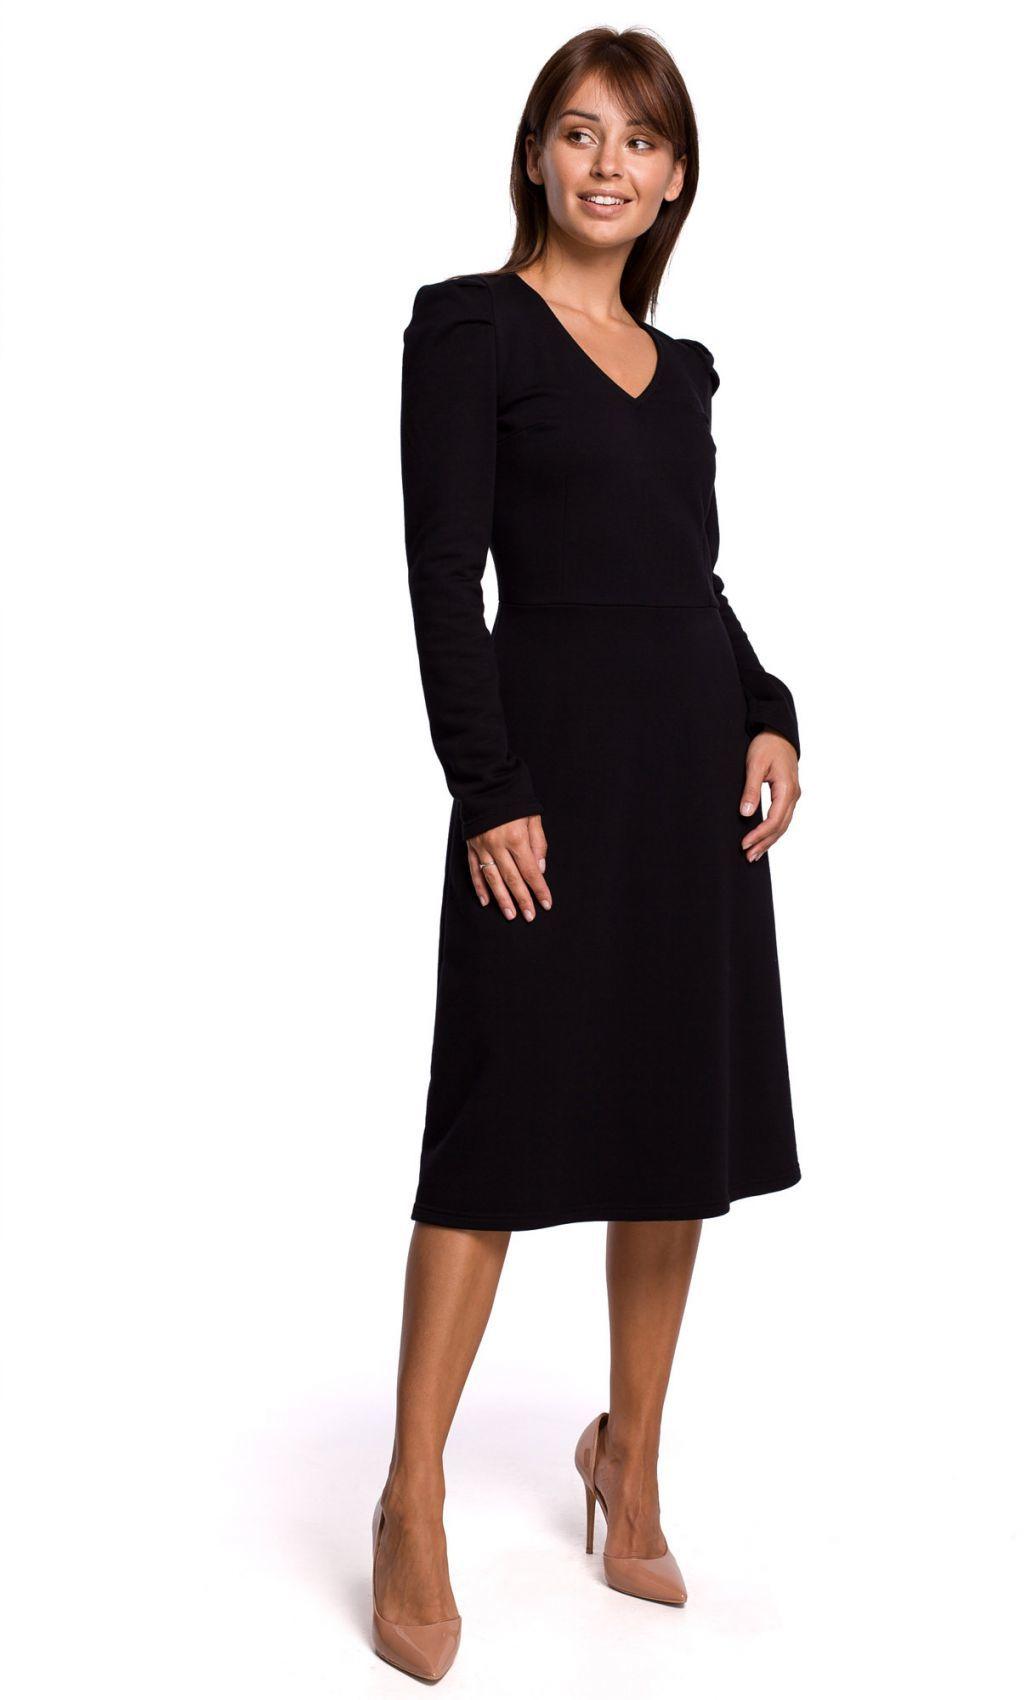 B162 Sukienka z bufkami - czarna